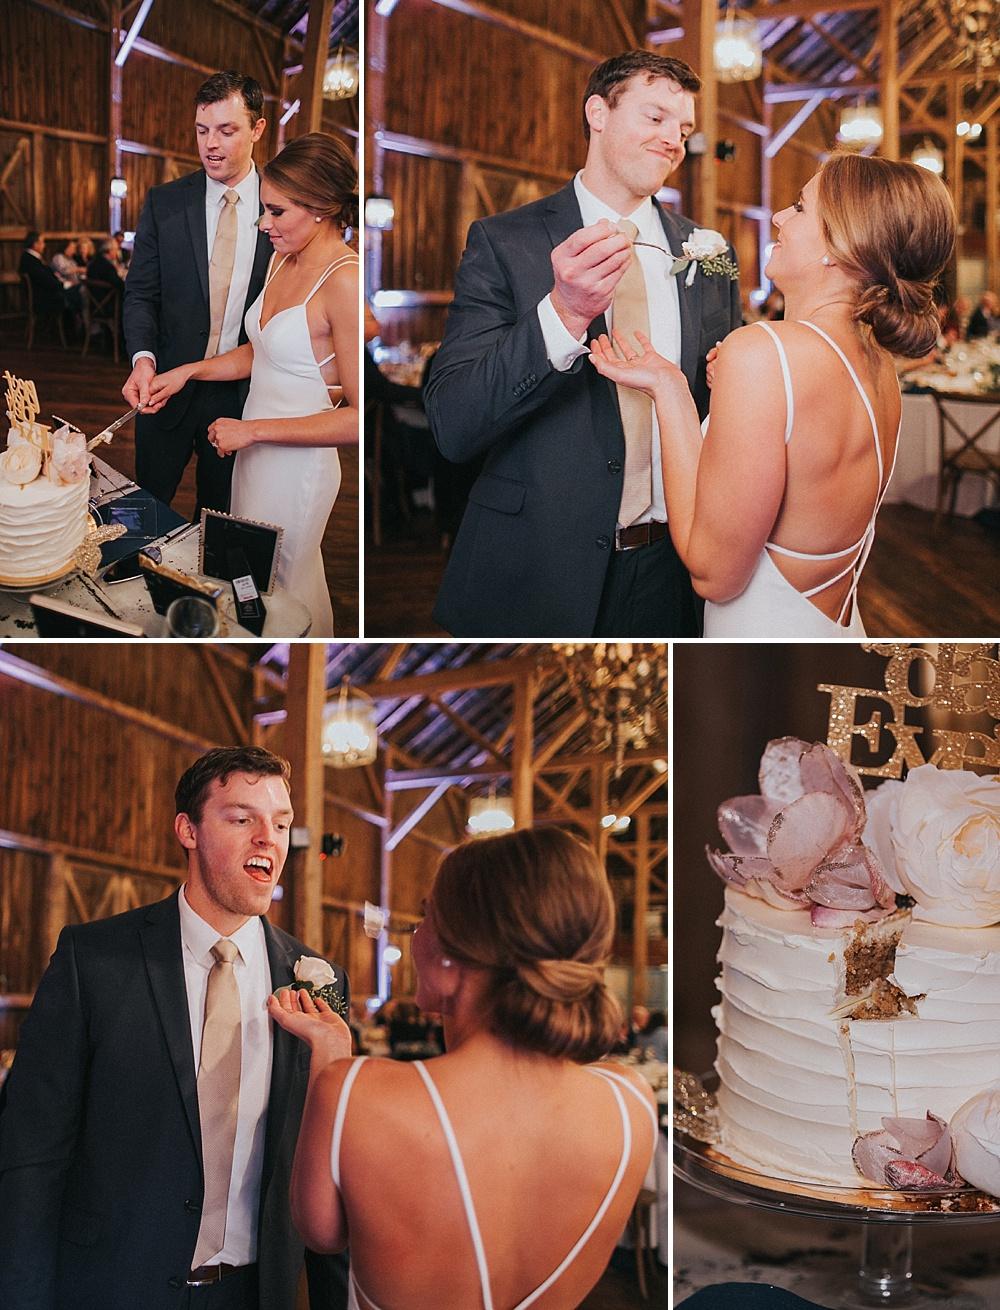 M-A_the-farm-at-dover-wedding_Liller-Photo_Milwaukee-Photographer_0051.jpg